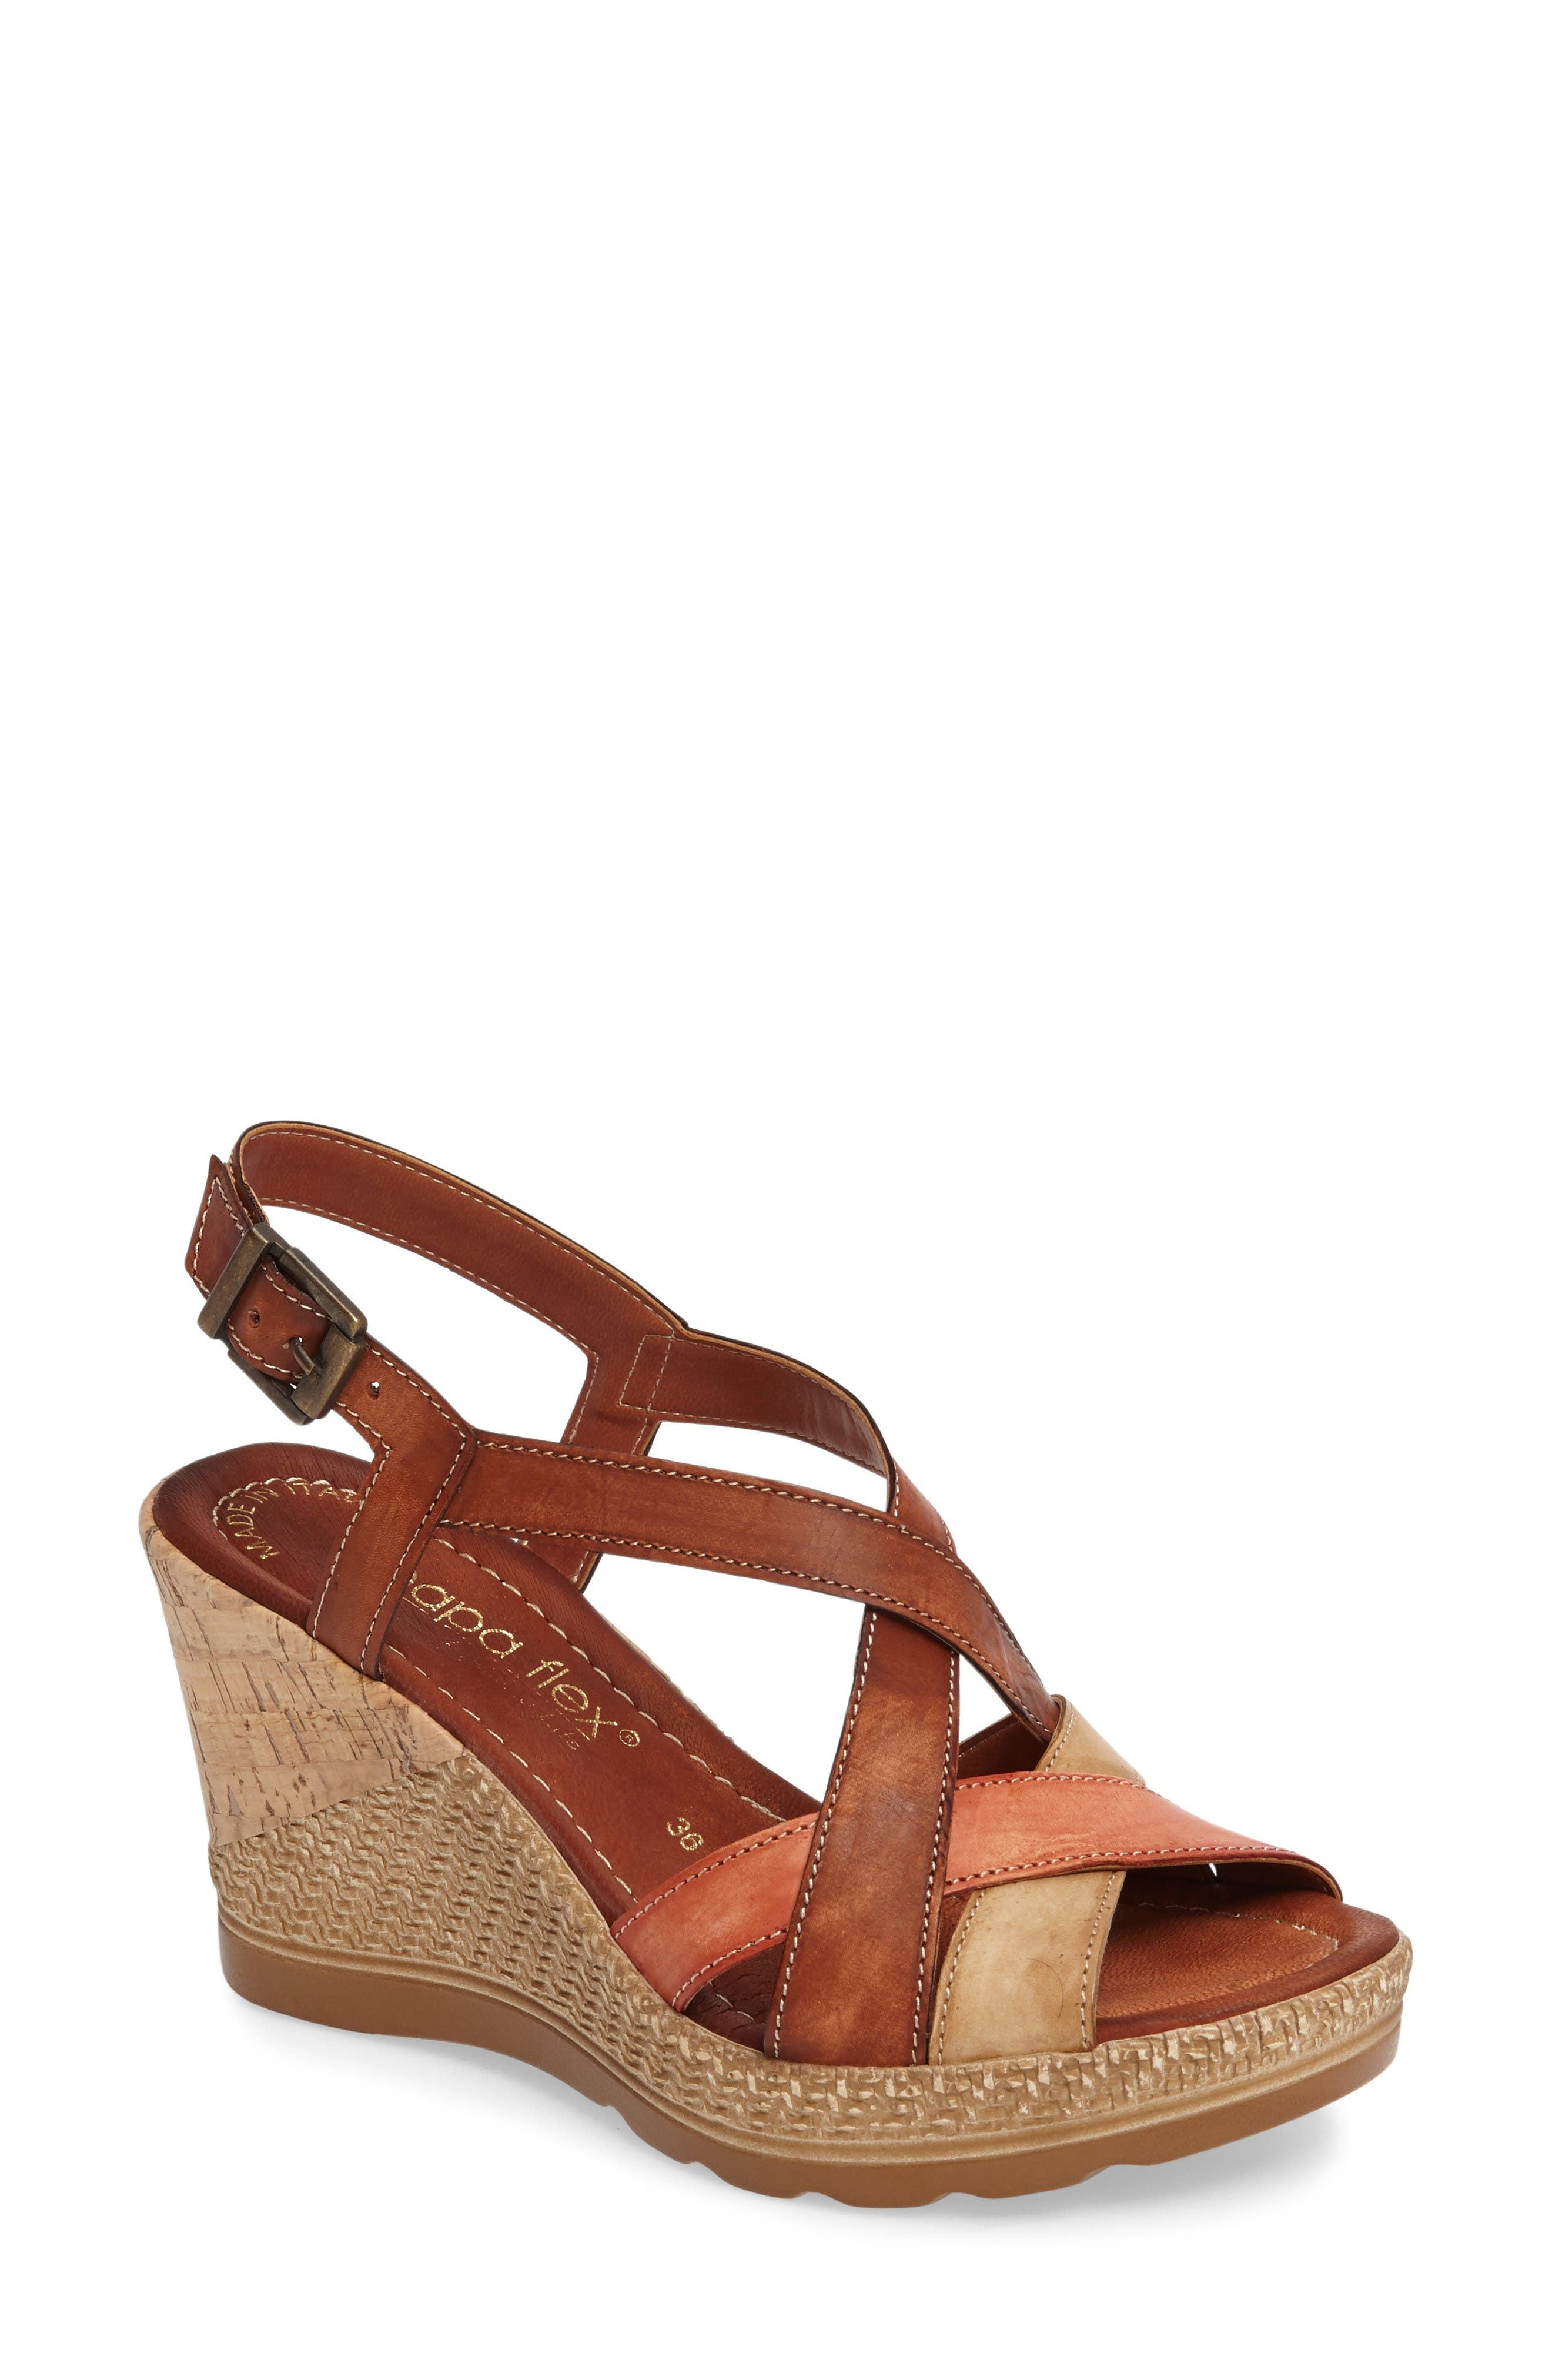 Modena Wedge Sandal,                         Main,                         color, Cognac Leather